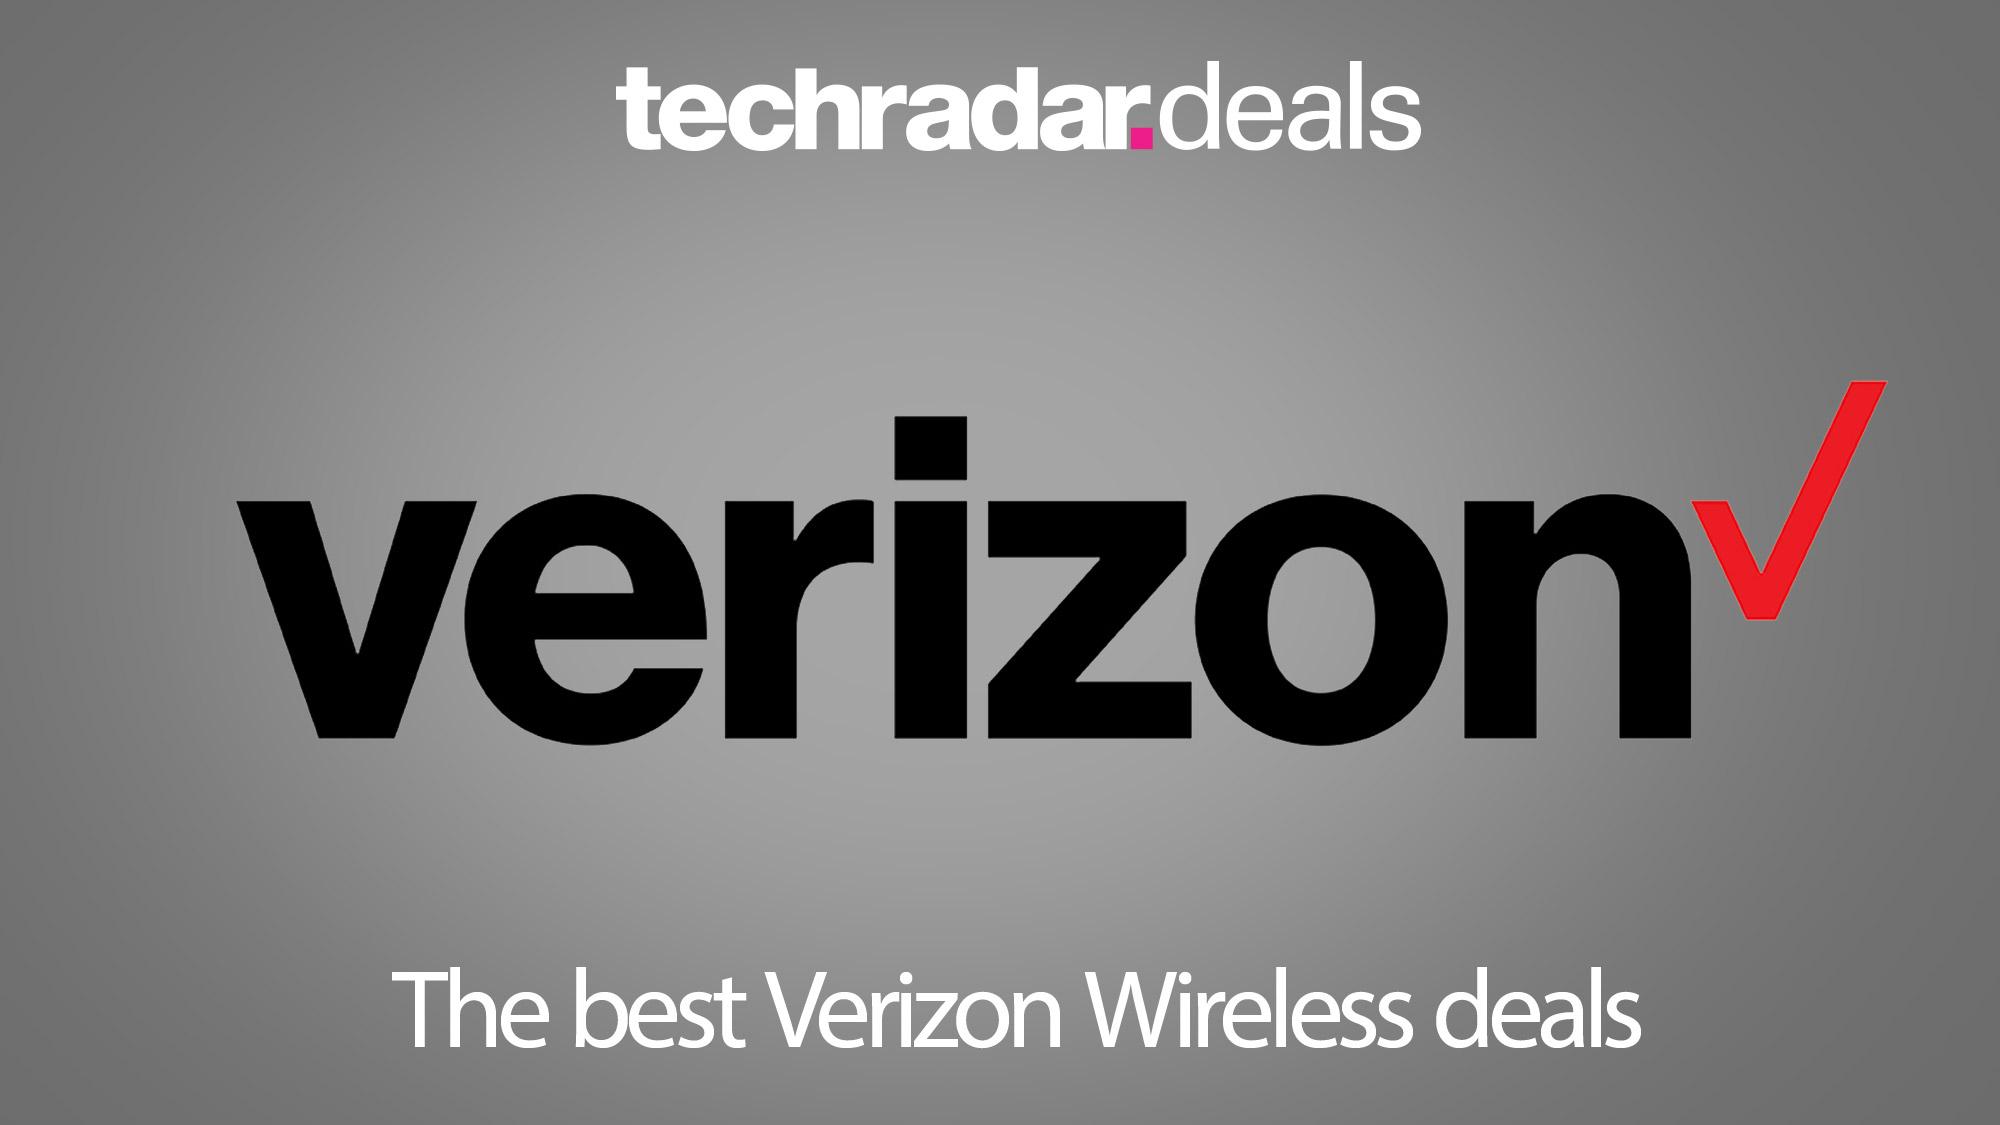 Verizon Wireless Christmas Deals 2020 The best Verizon Wireless plans in September 2020 | TechRadar